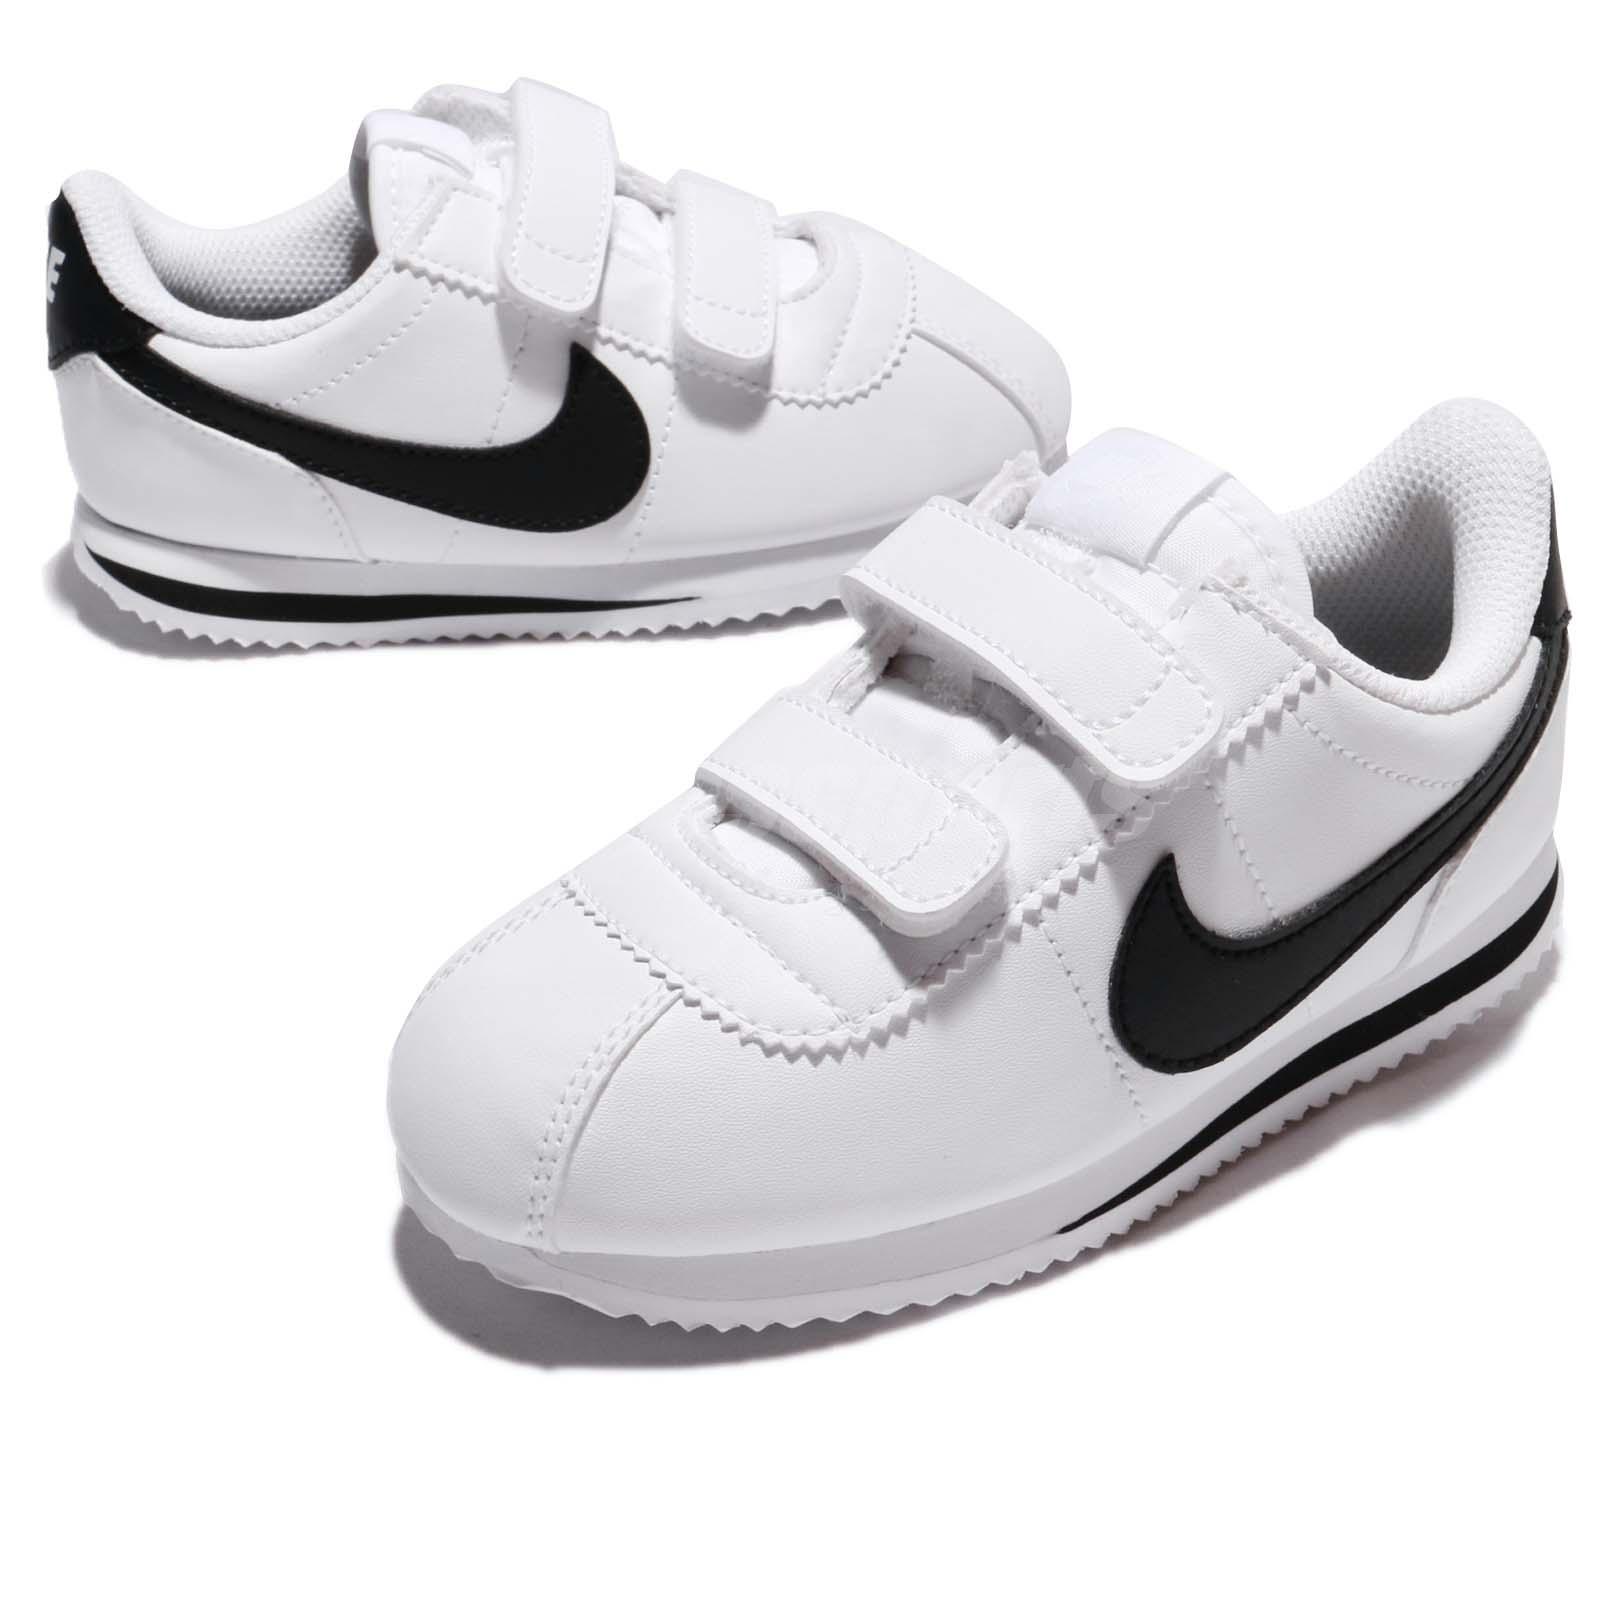 823e27c8326 Details about Nike Cortez Basic SL TDV White Black Toddler Infant Baby Shoe  Sneaker 904769-102